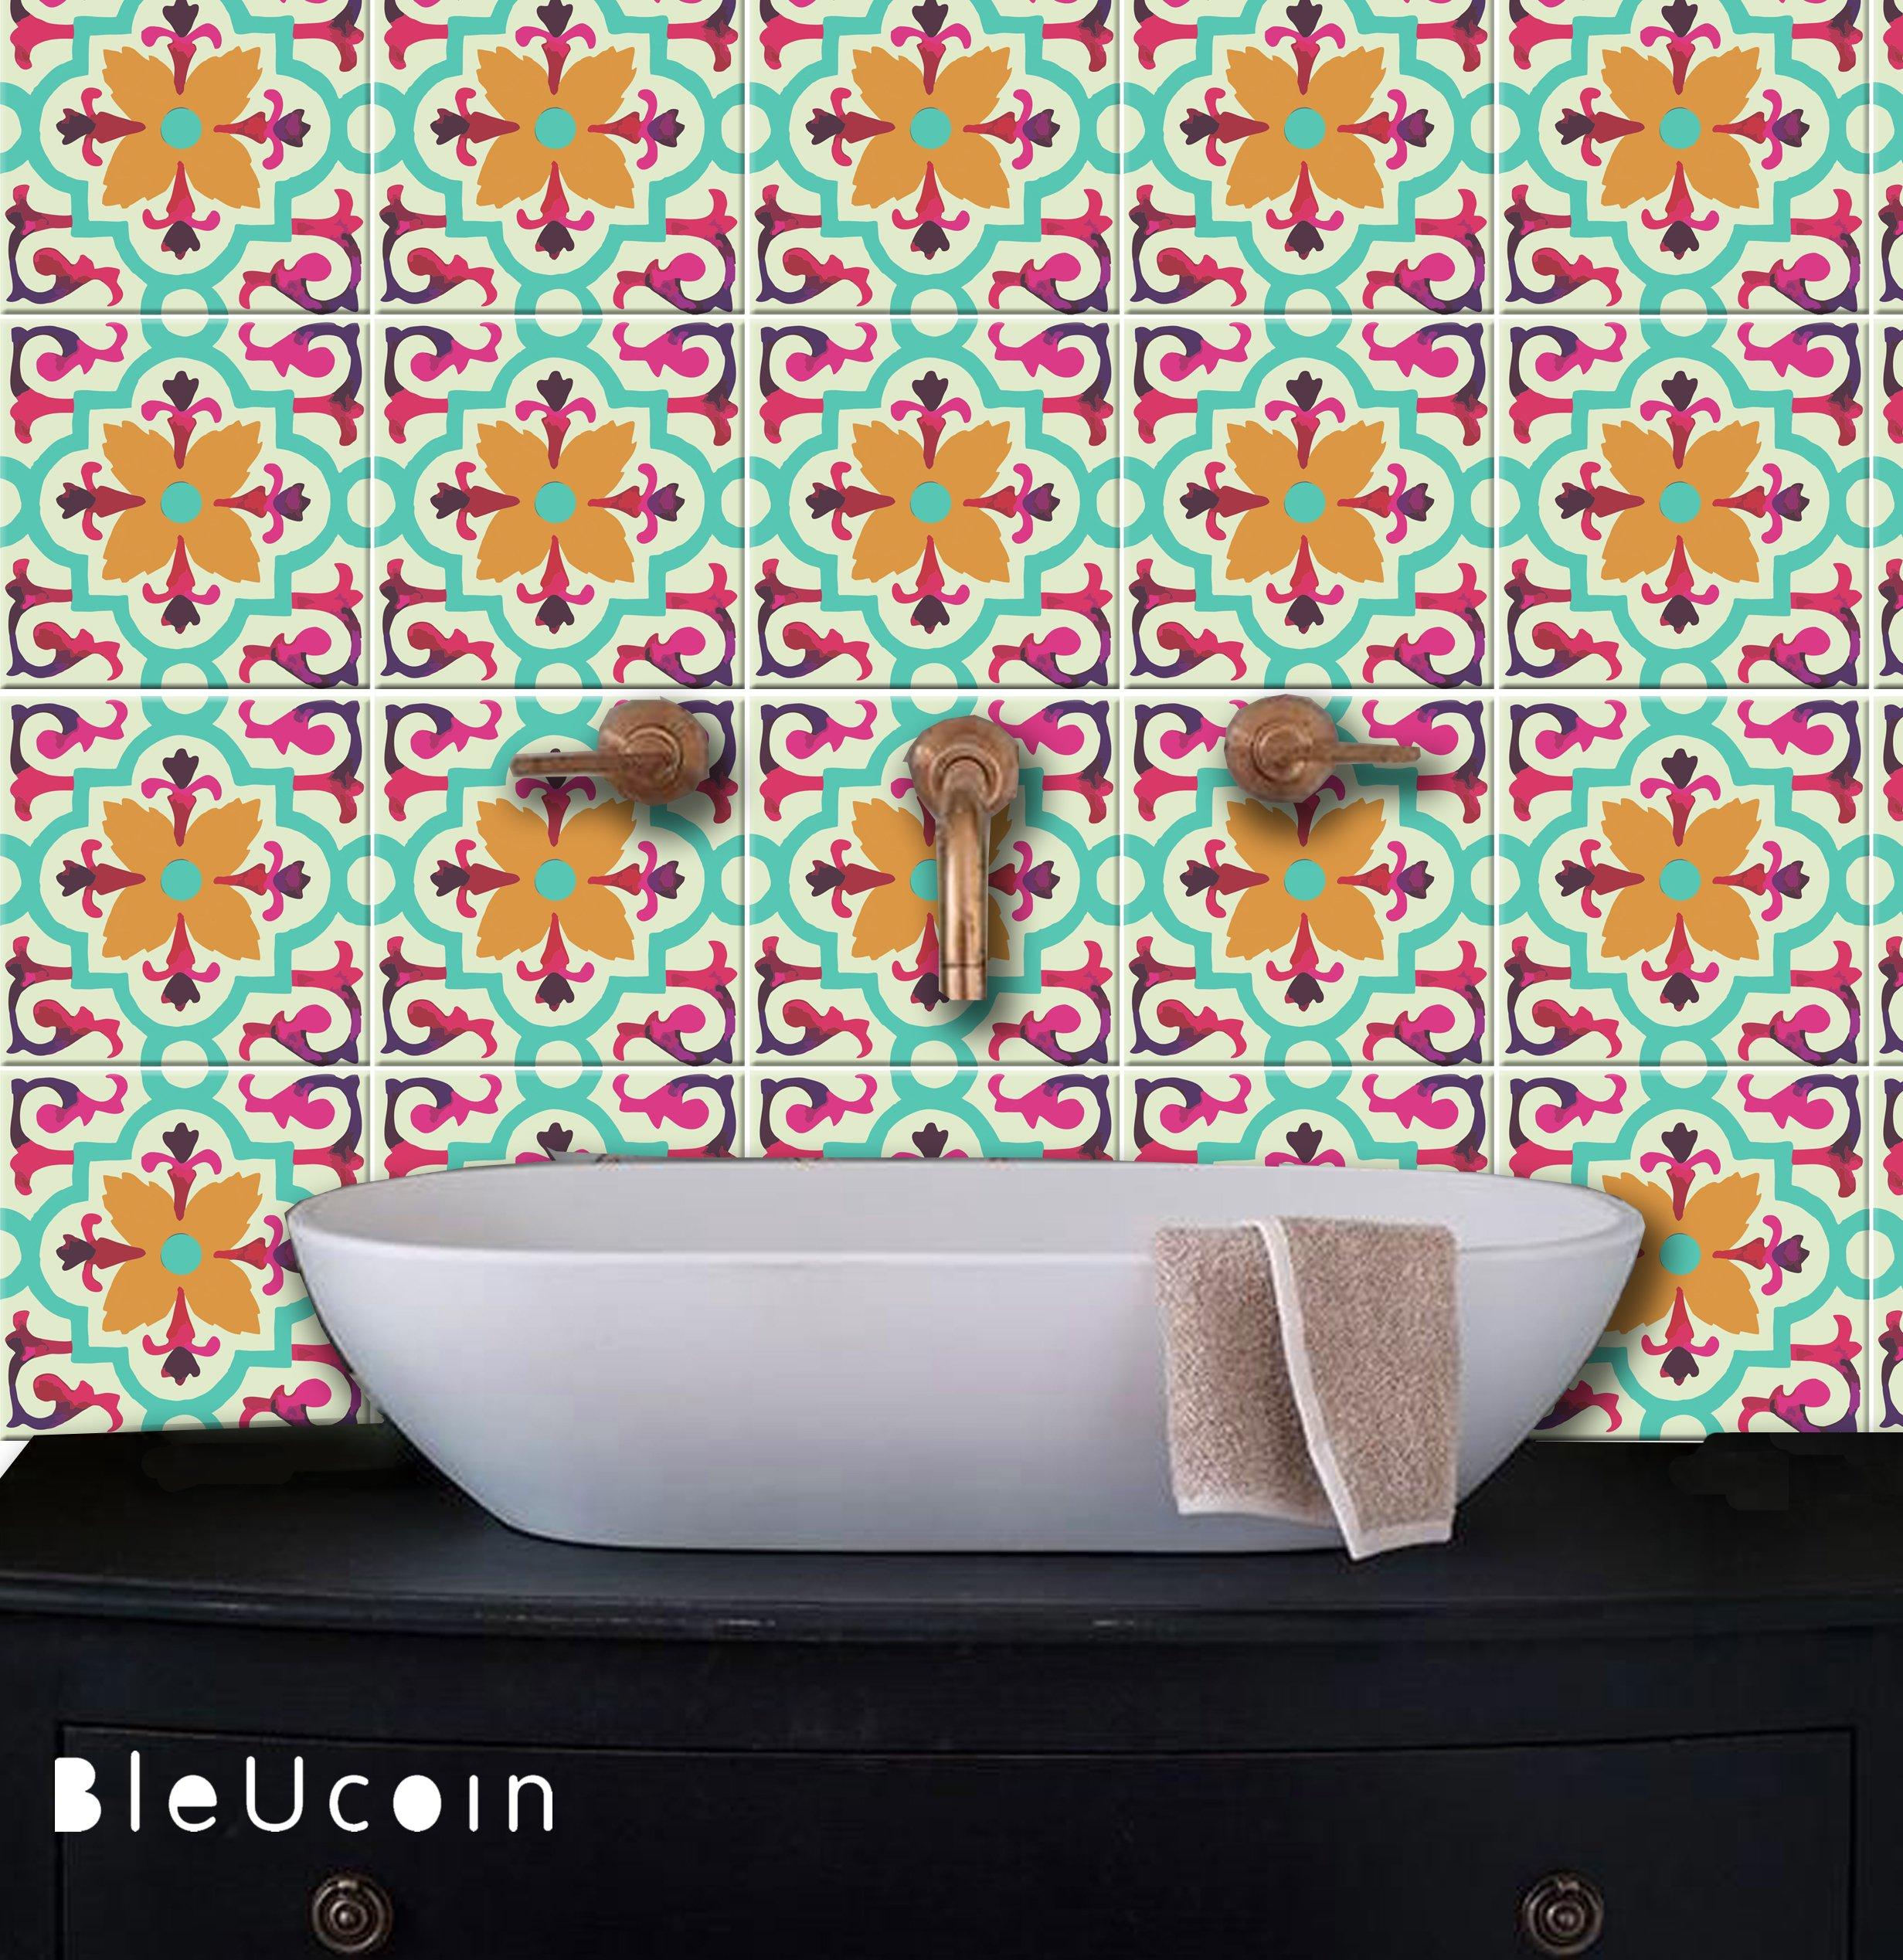 Amazon Com Art Deco Multicolour Tile Stickers For Kitchen Bathroom Backsplash Removable Stair Riser Peel Stick Home Decor Pack Of 44 4 25 X Inches